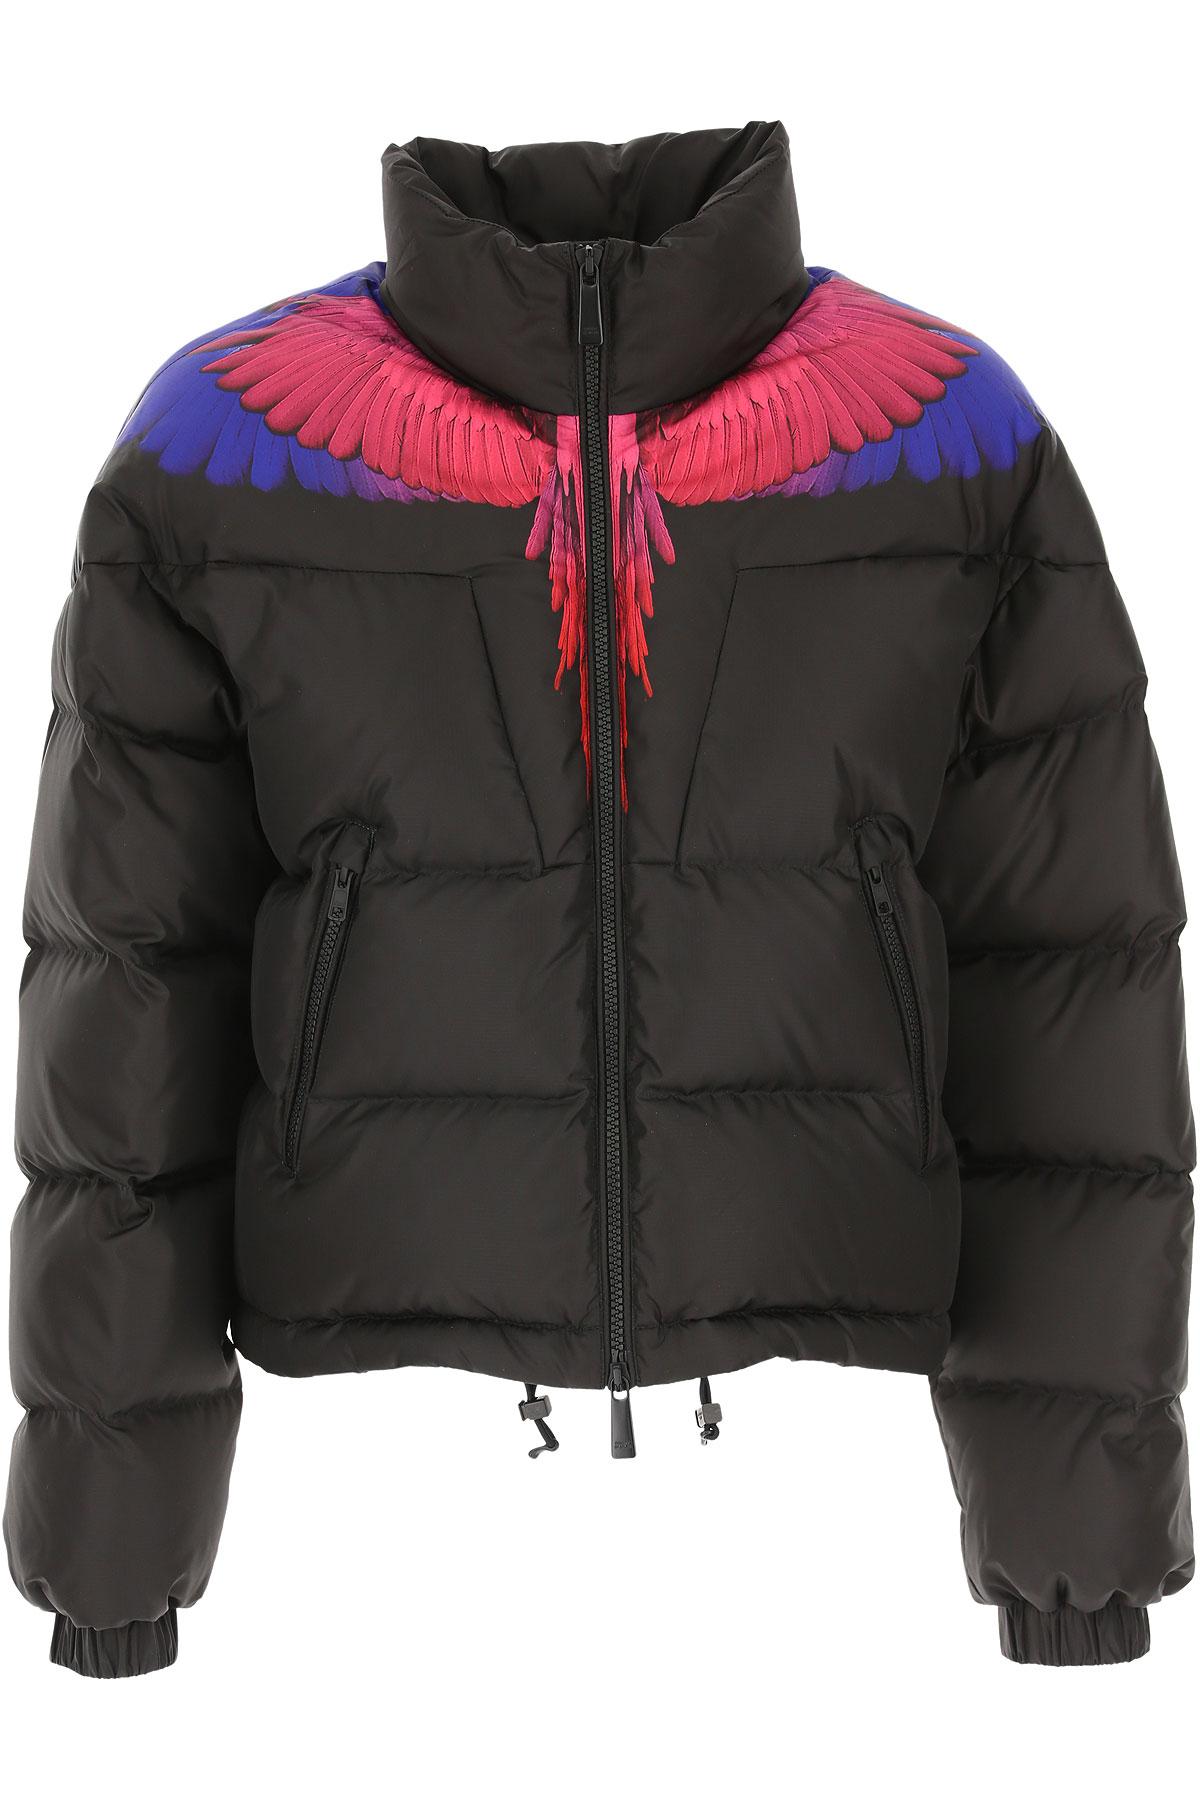 Image of Marcelo Burlon Down Jacket for Women, Puffer Ski Jacket, Black, Down, 2017, 2 6 8